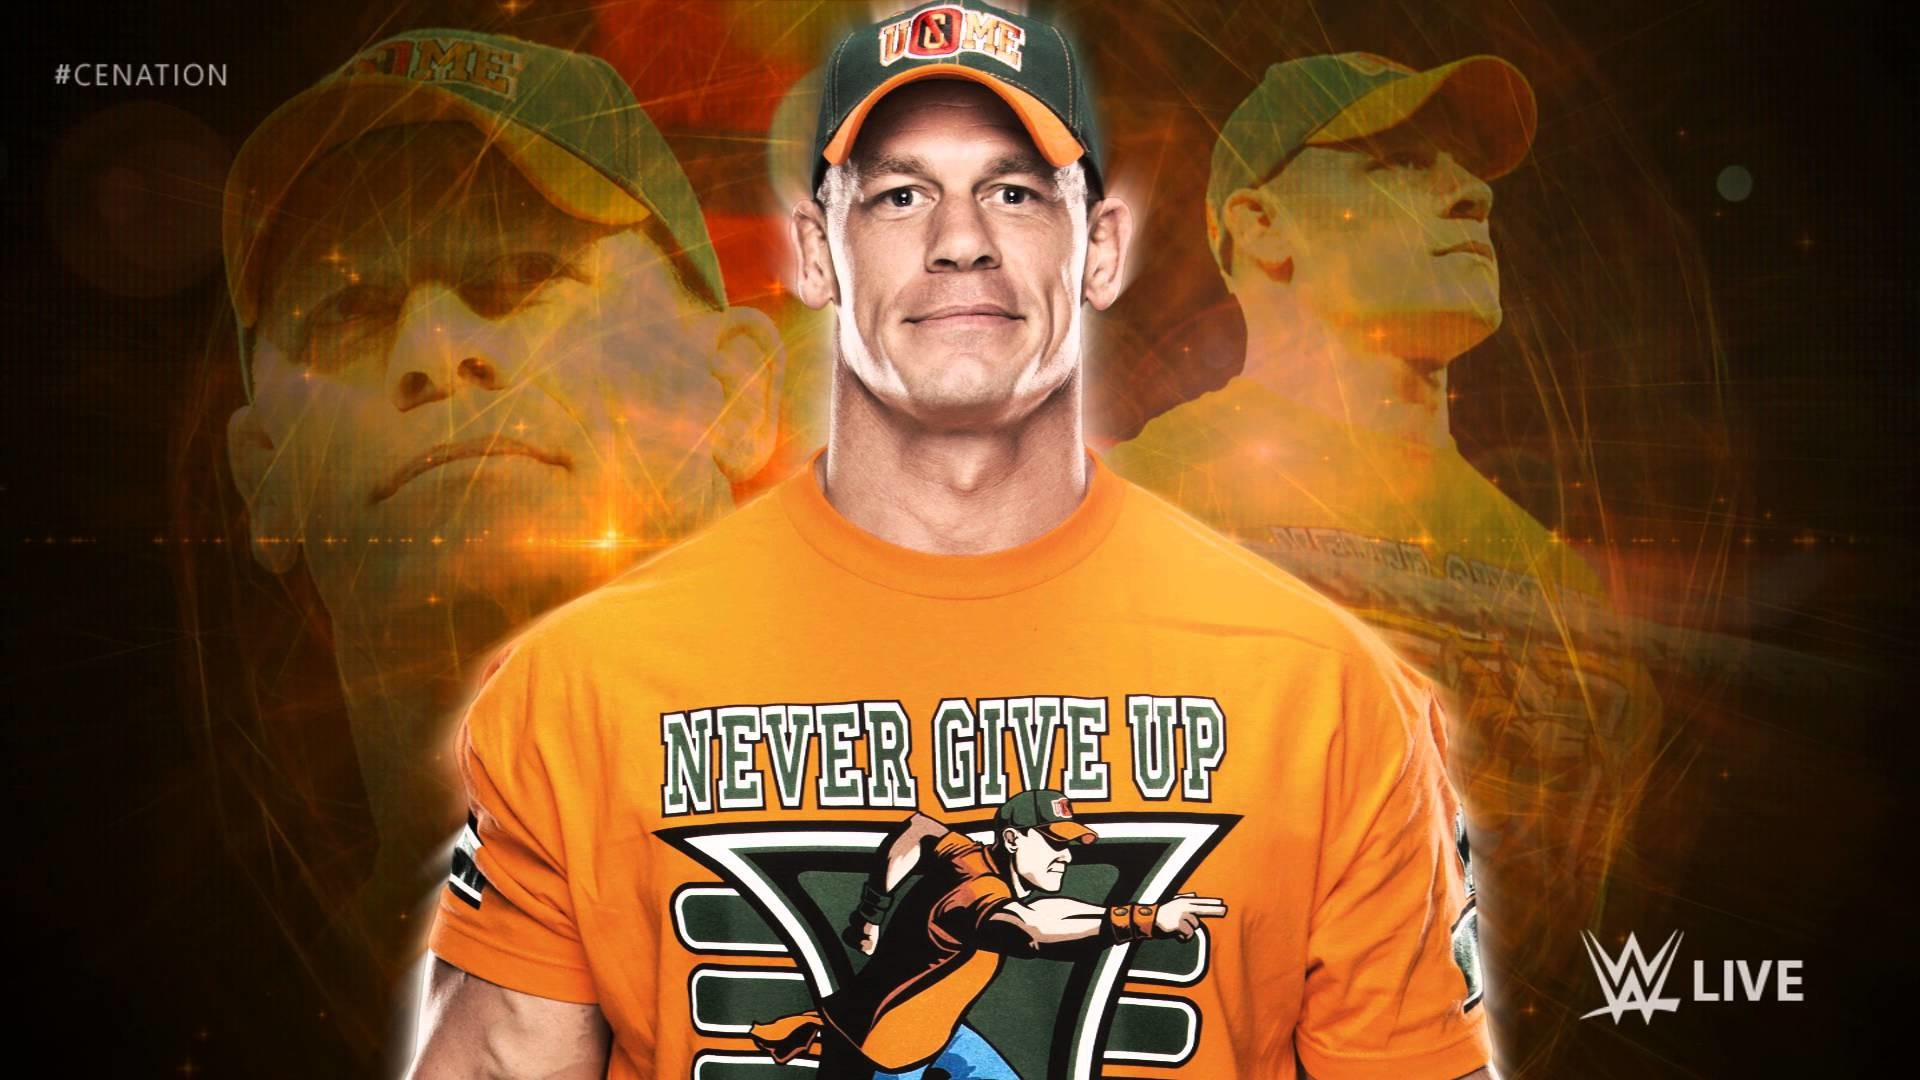 John Cena 2017 HD Wallpapers 1